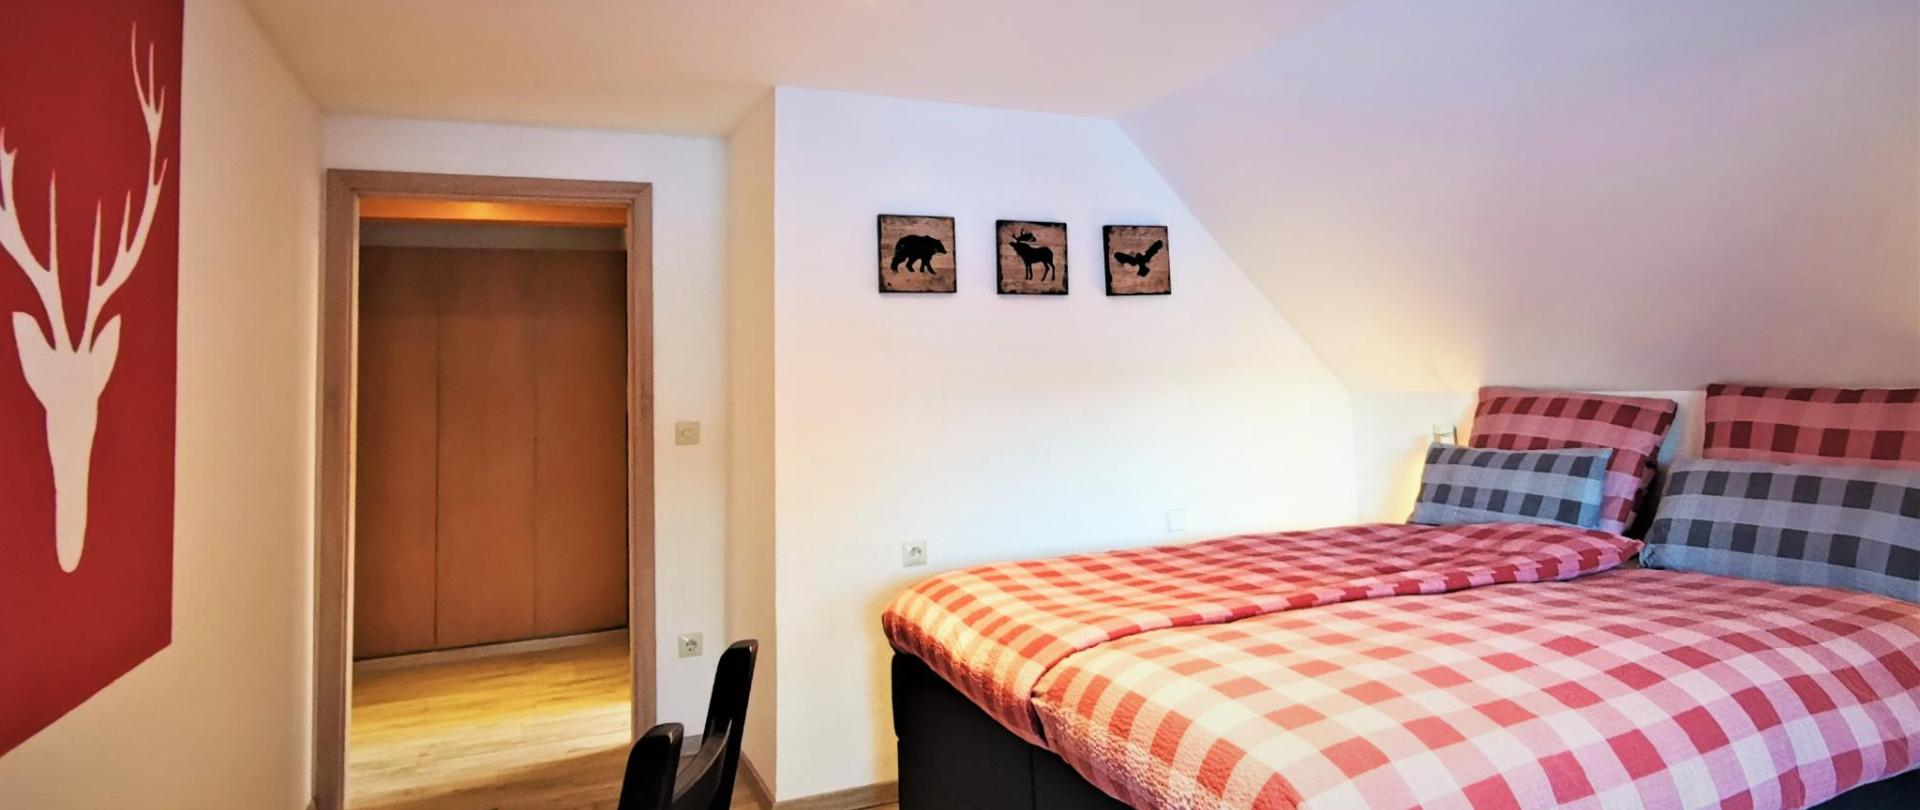 Zimmer11.jpg